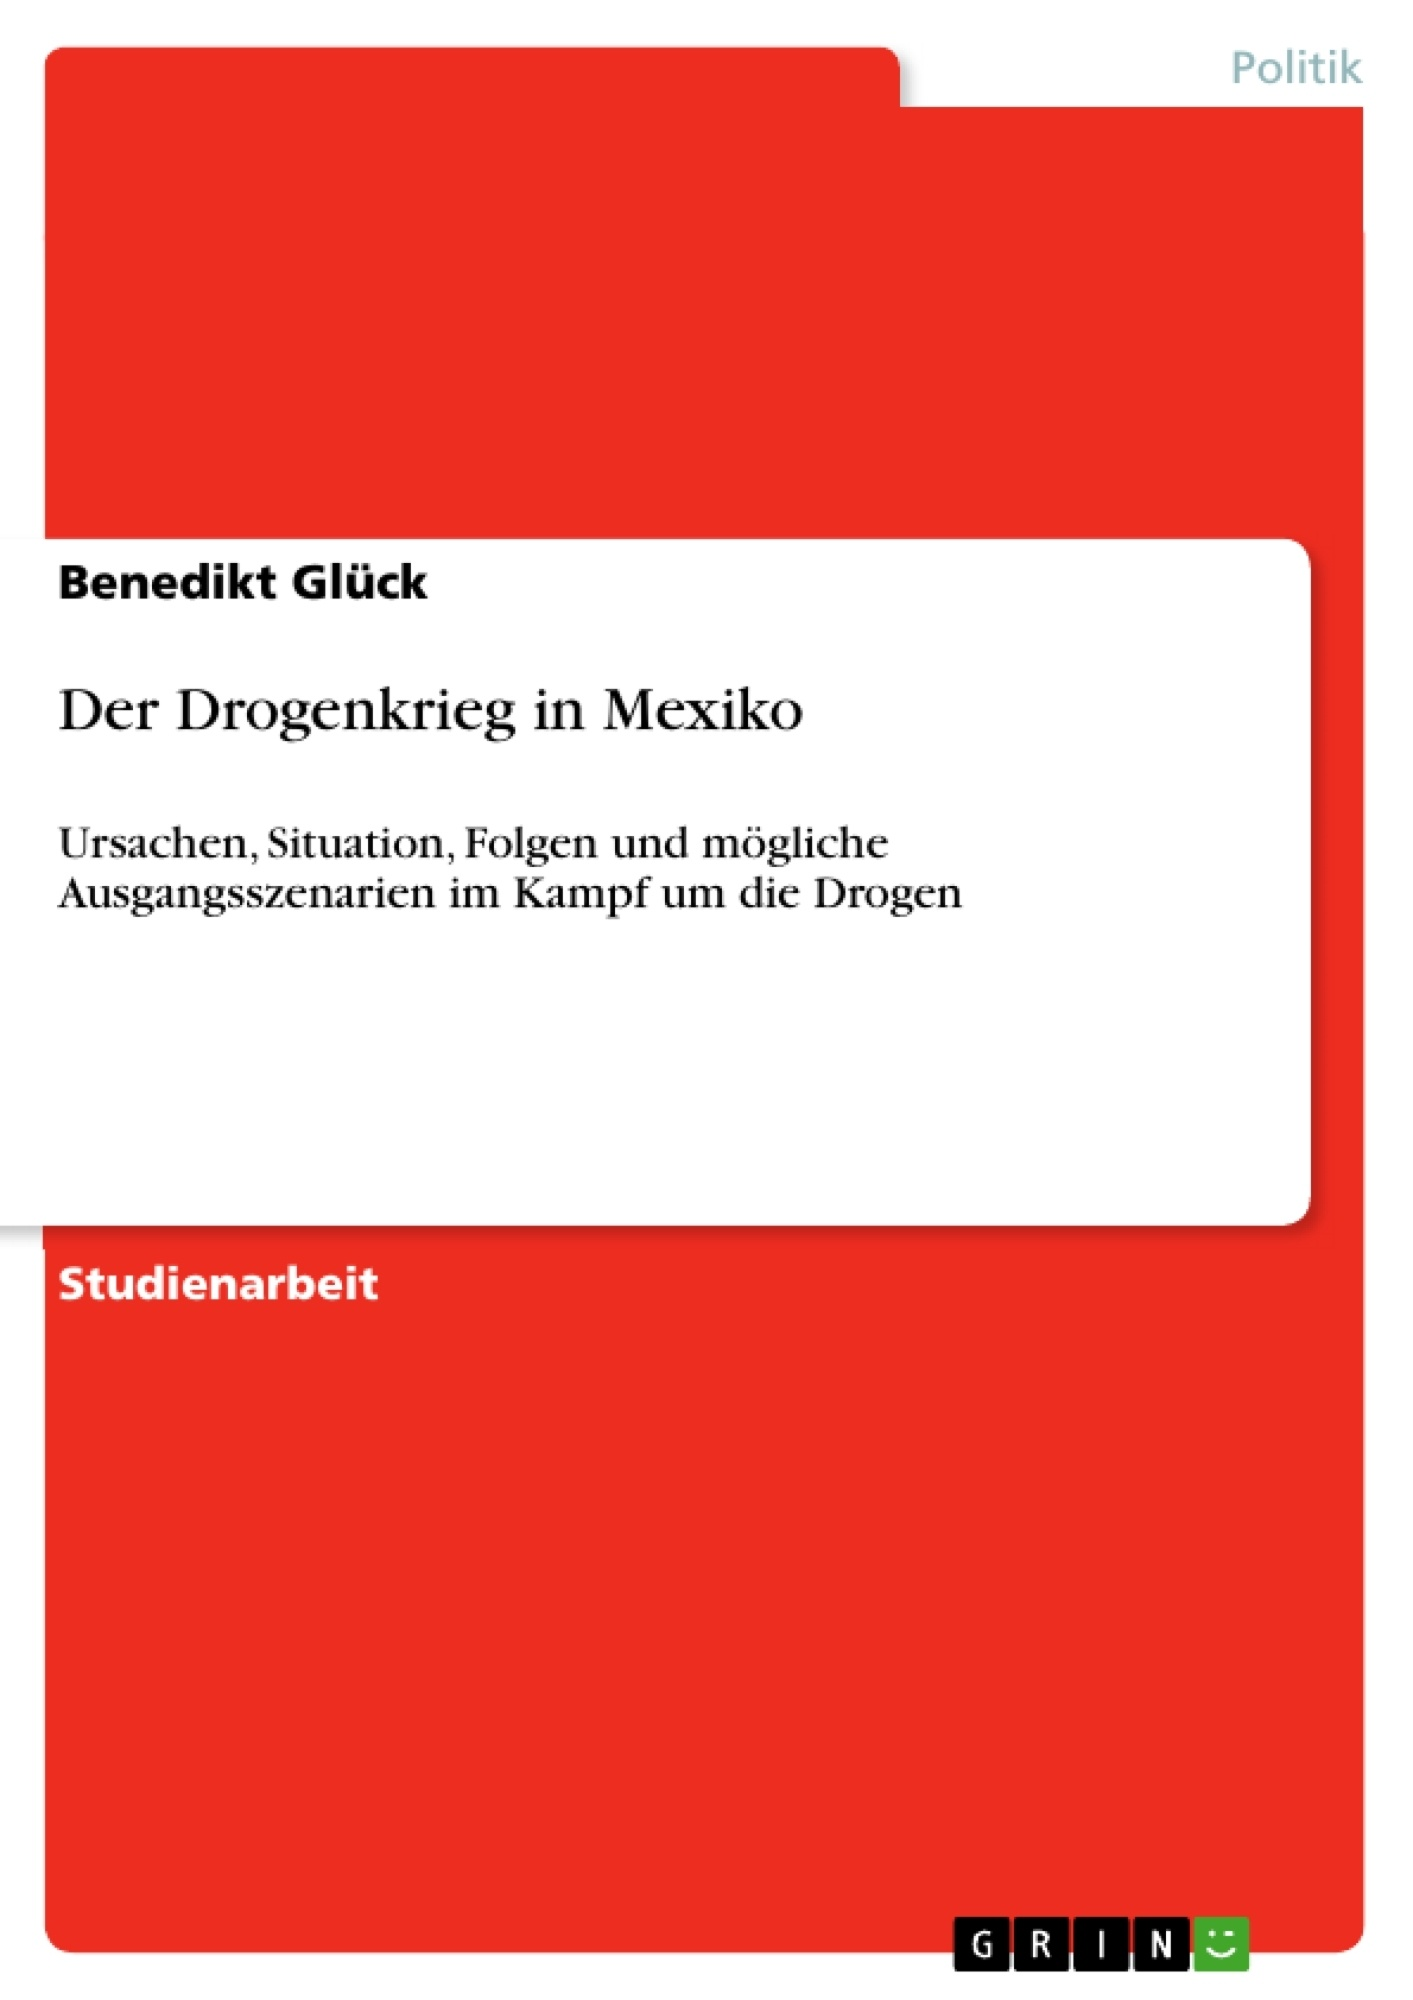 Title: Der Drogenkrieg in Mexiko